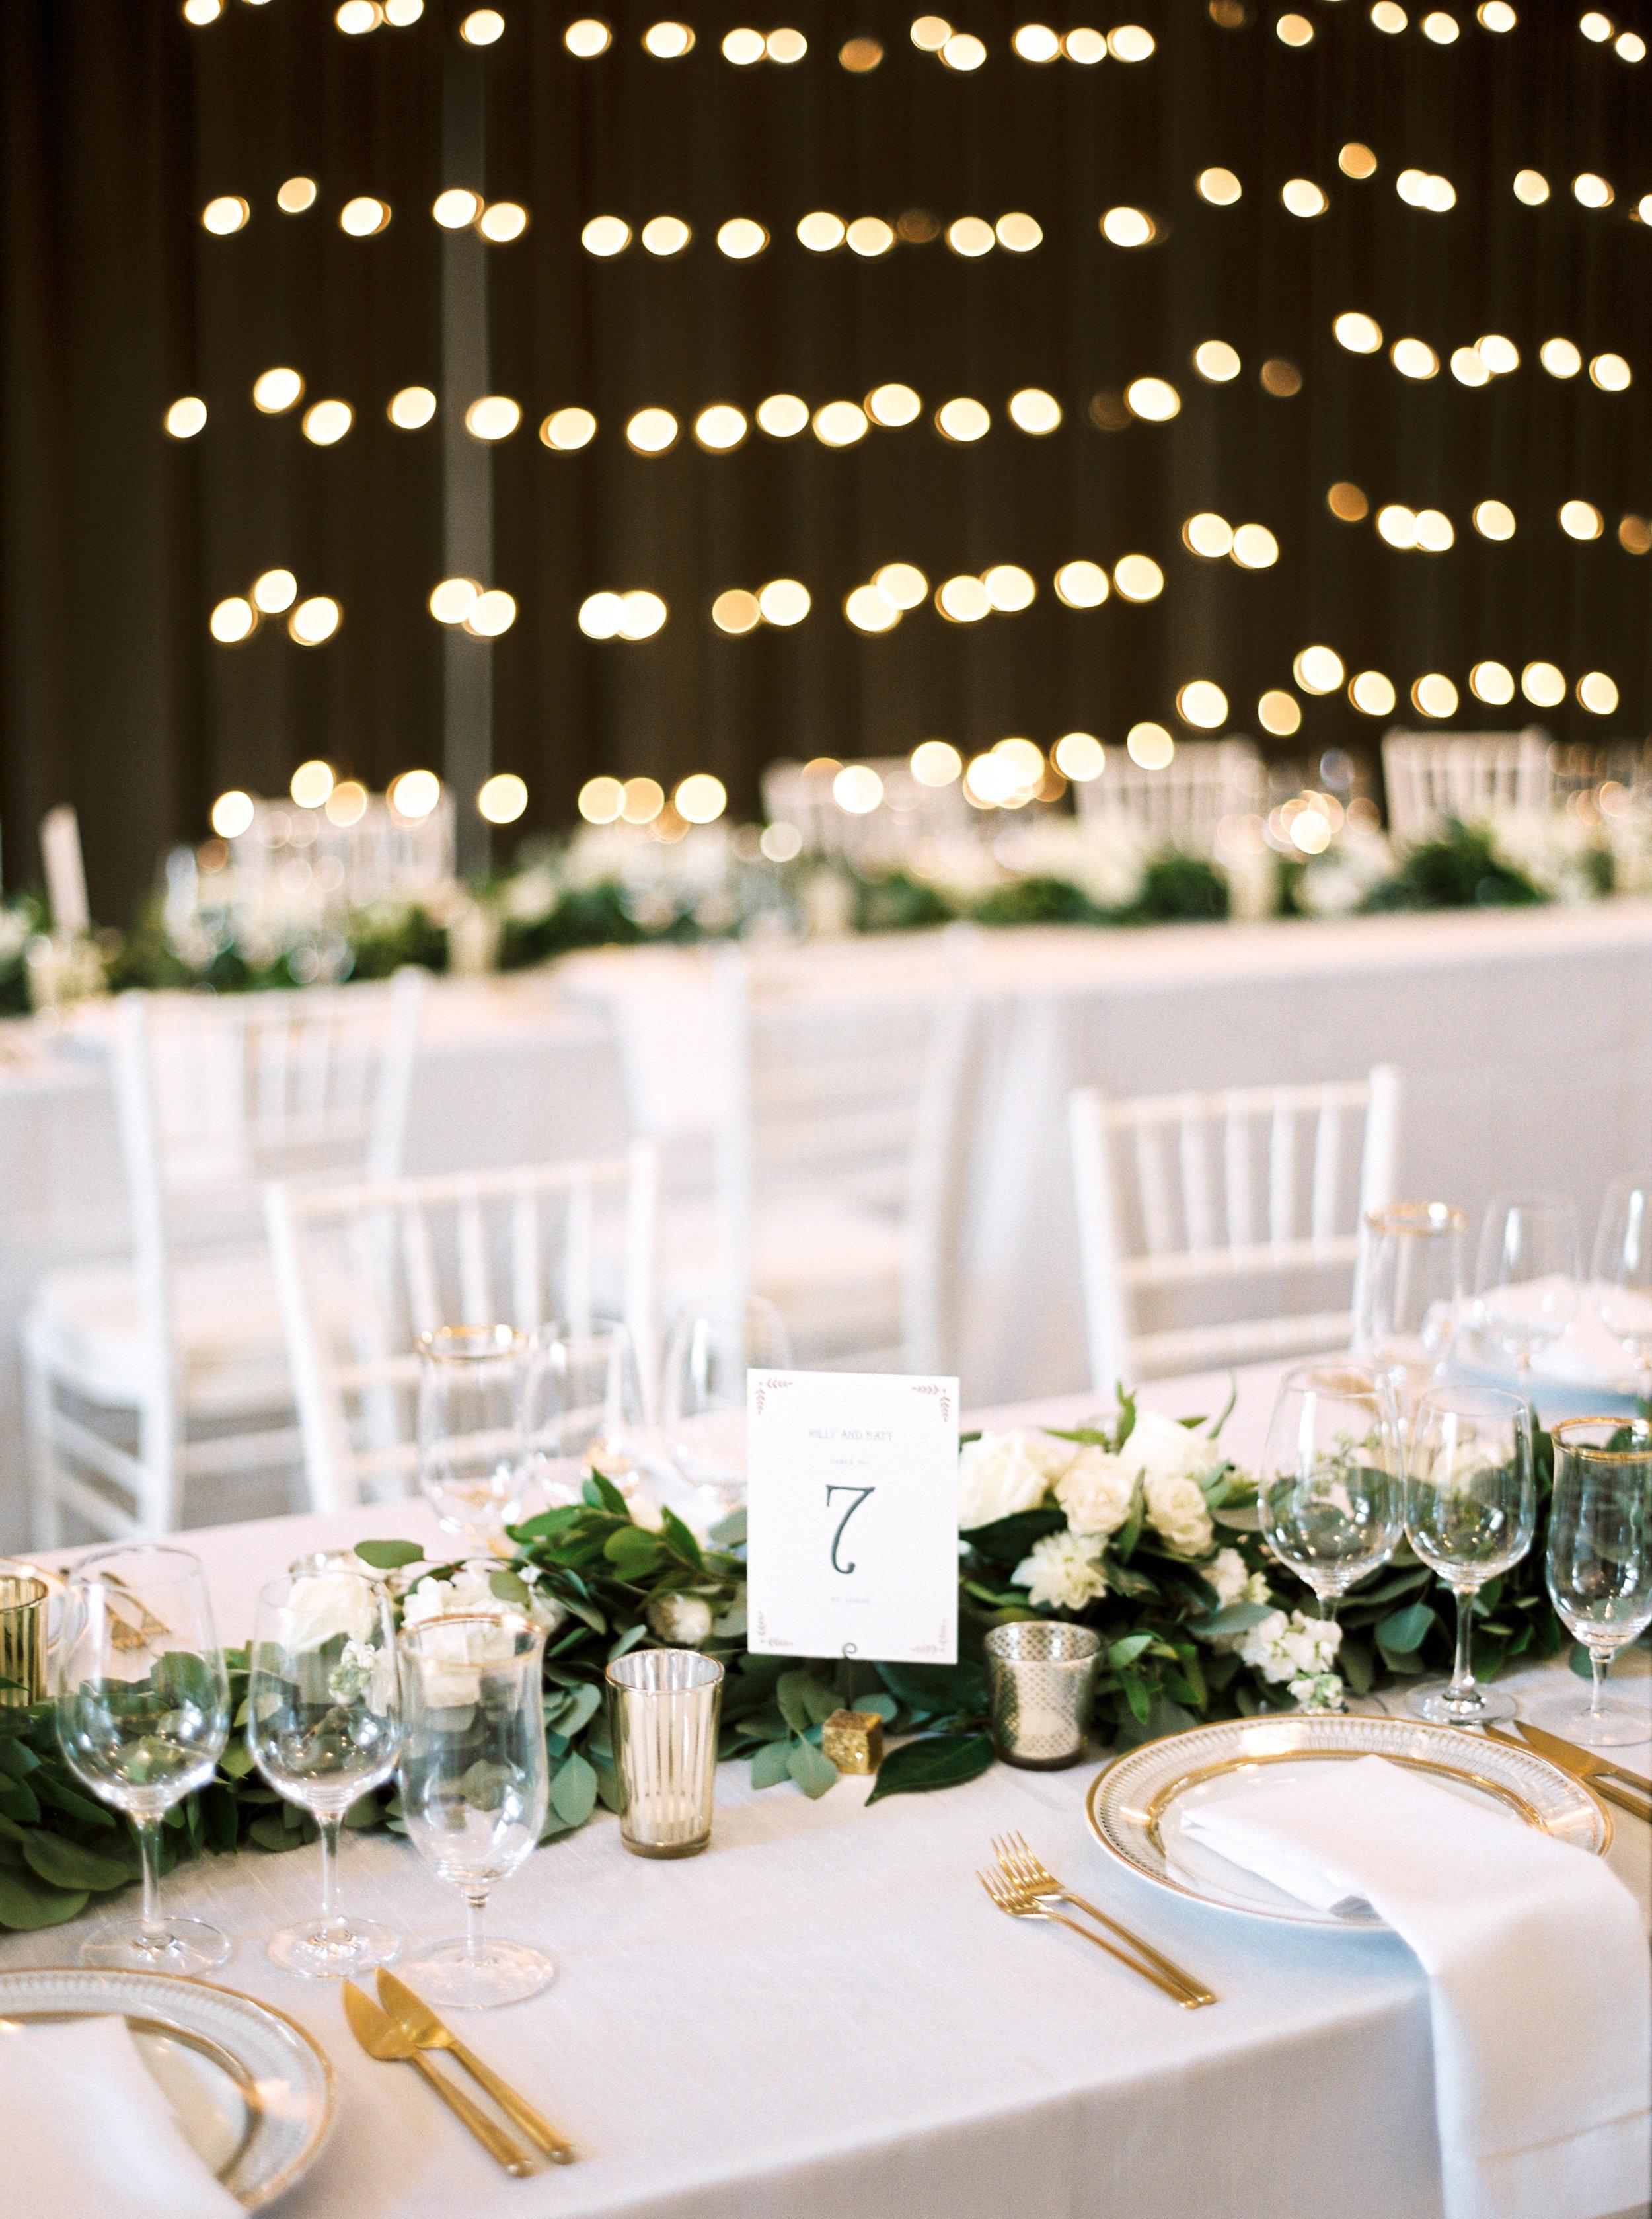 intimate-wedding-at-solage-calistoga-in-napa-178.jpg